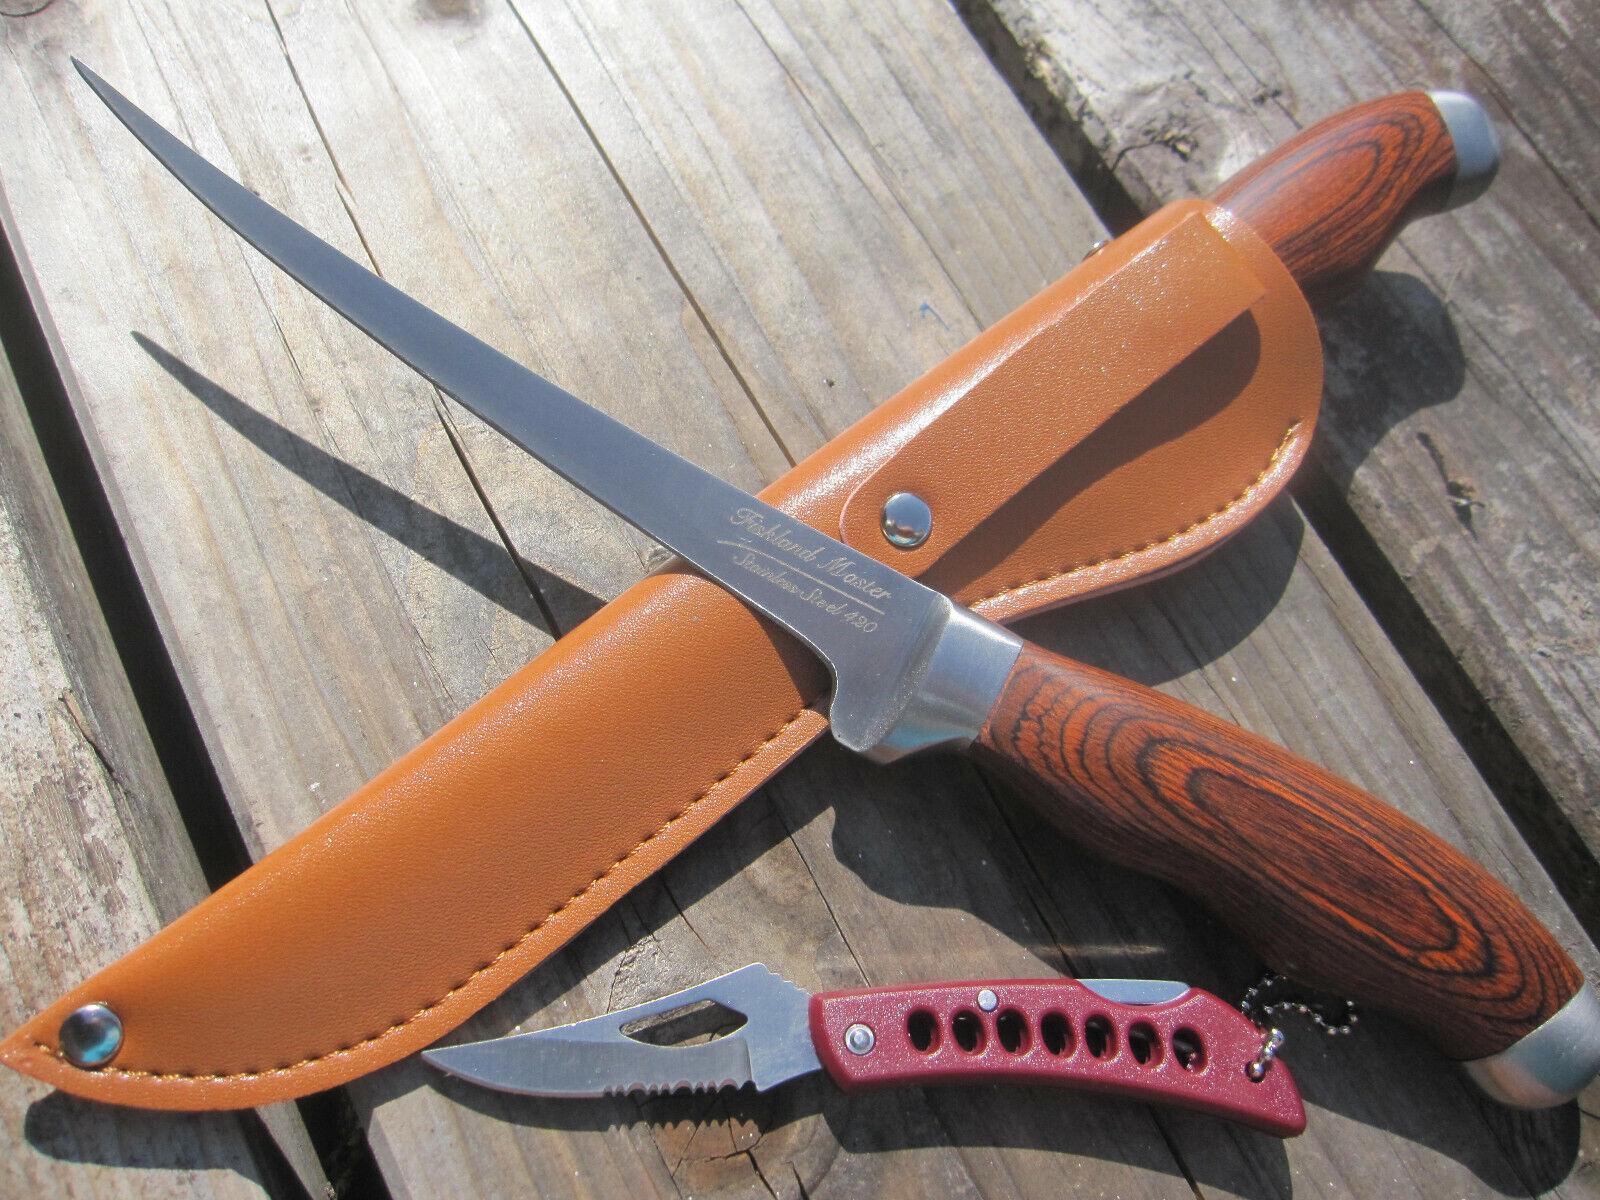 2 in 1 Fiskland Yad Filetiermesser Filiermesser Angel Messer + Taschenmesser